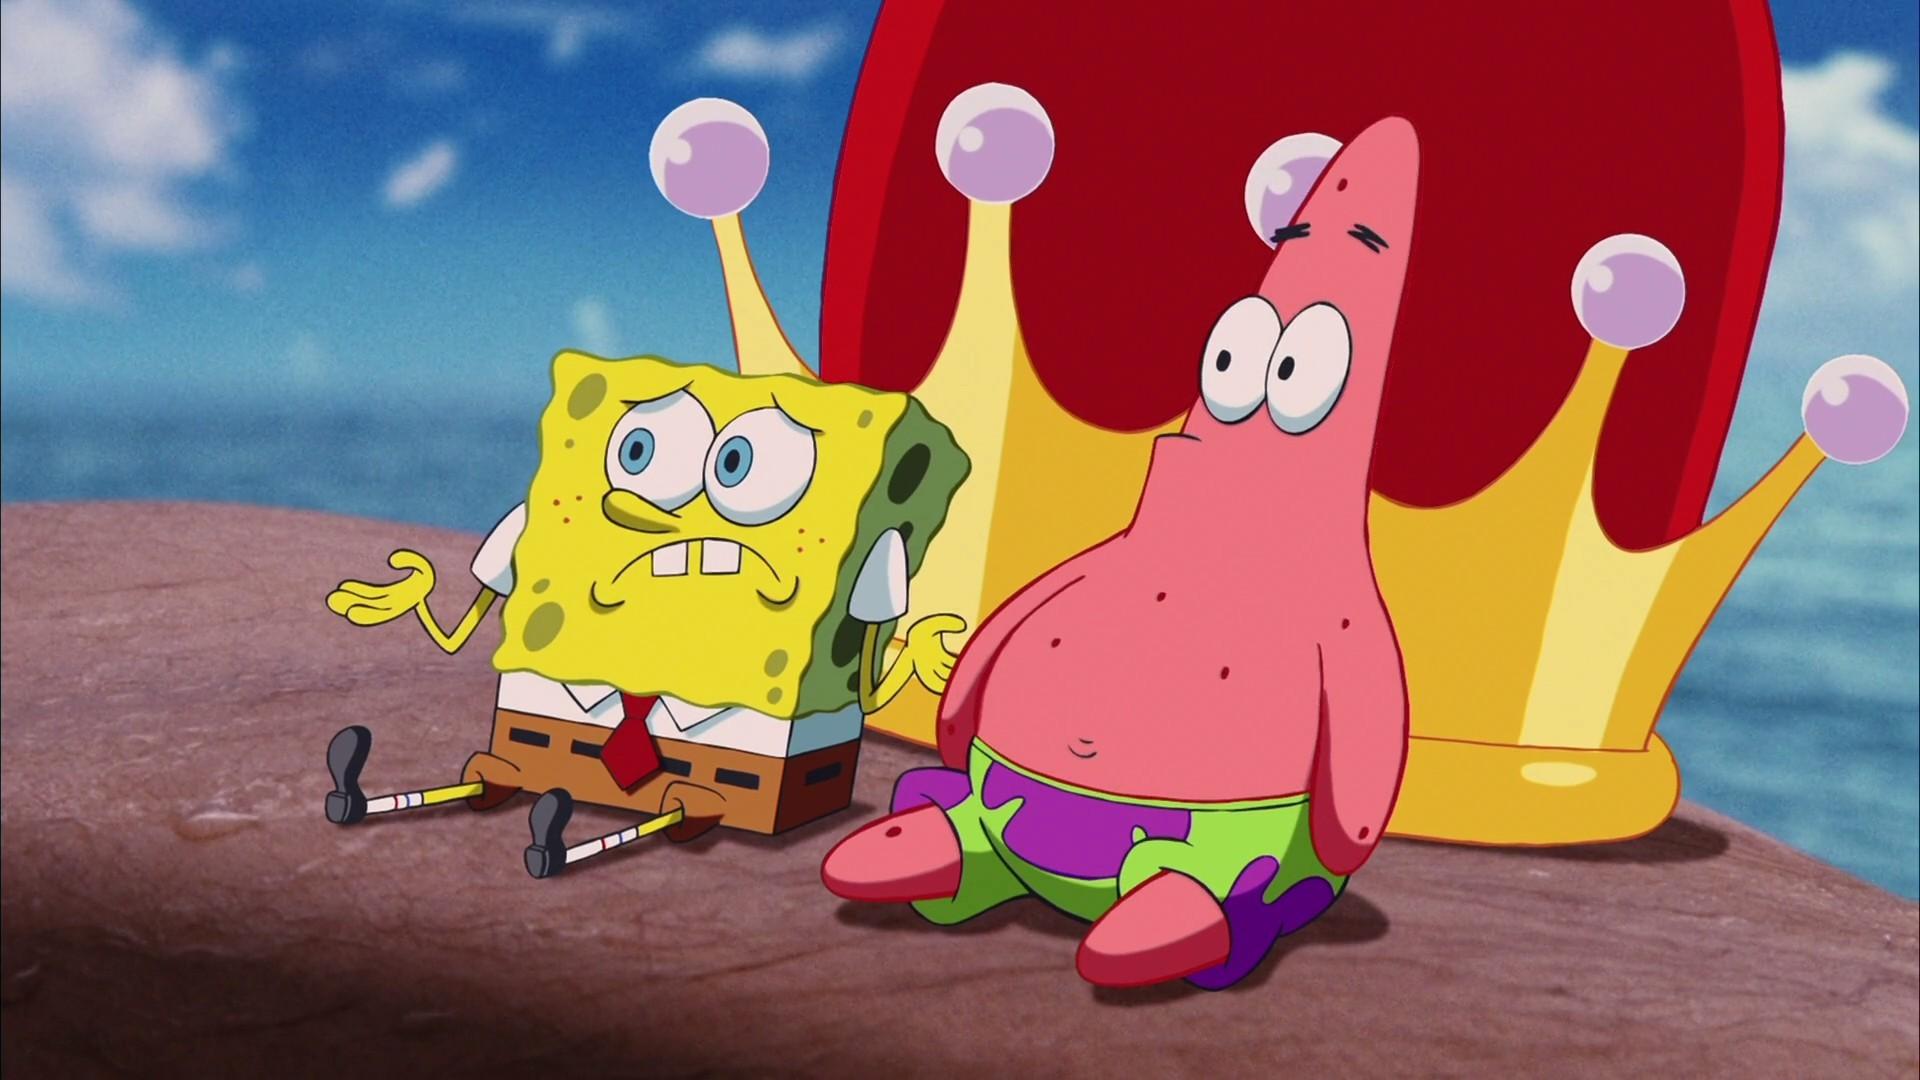 … spongebob and patrick wallpaper hd backgrounds hd wallpapers …